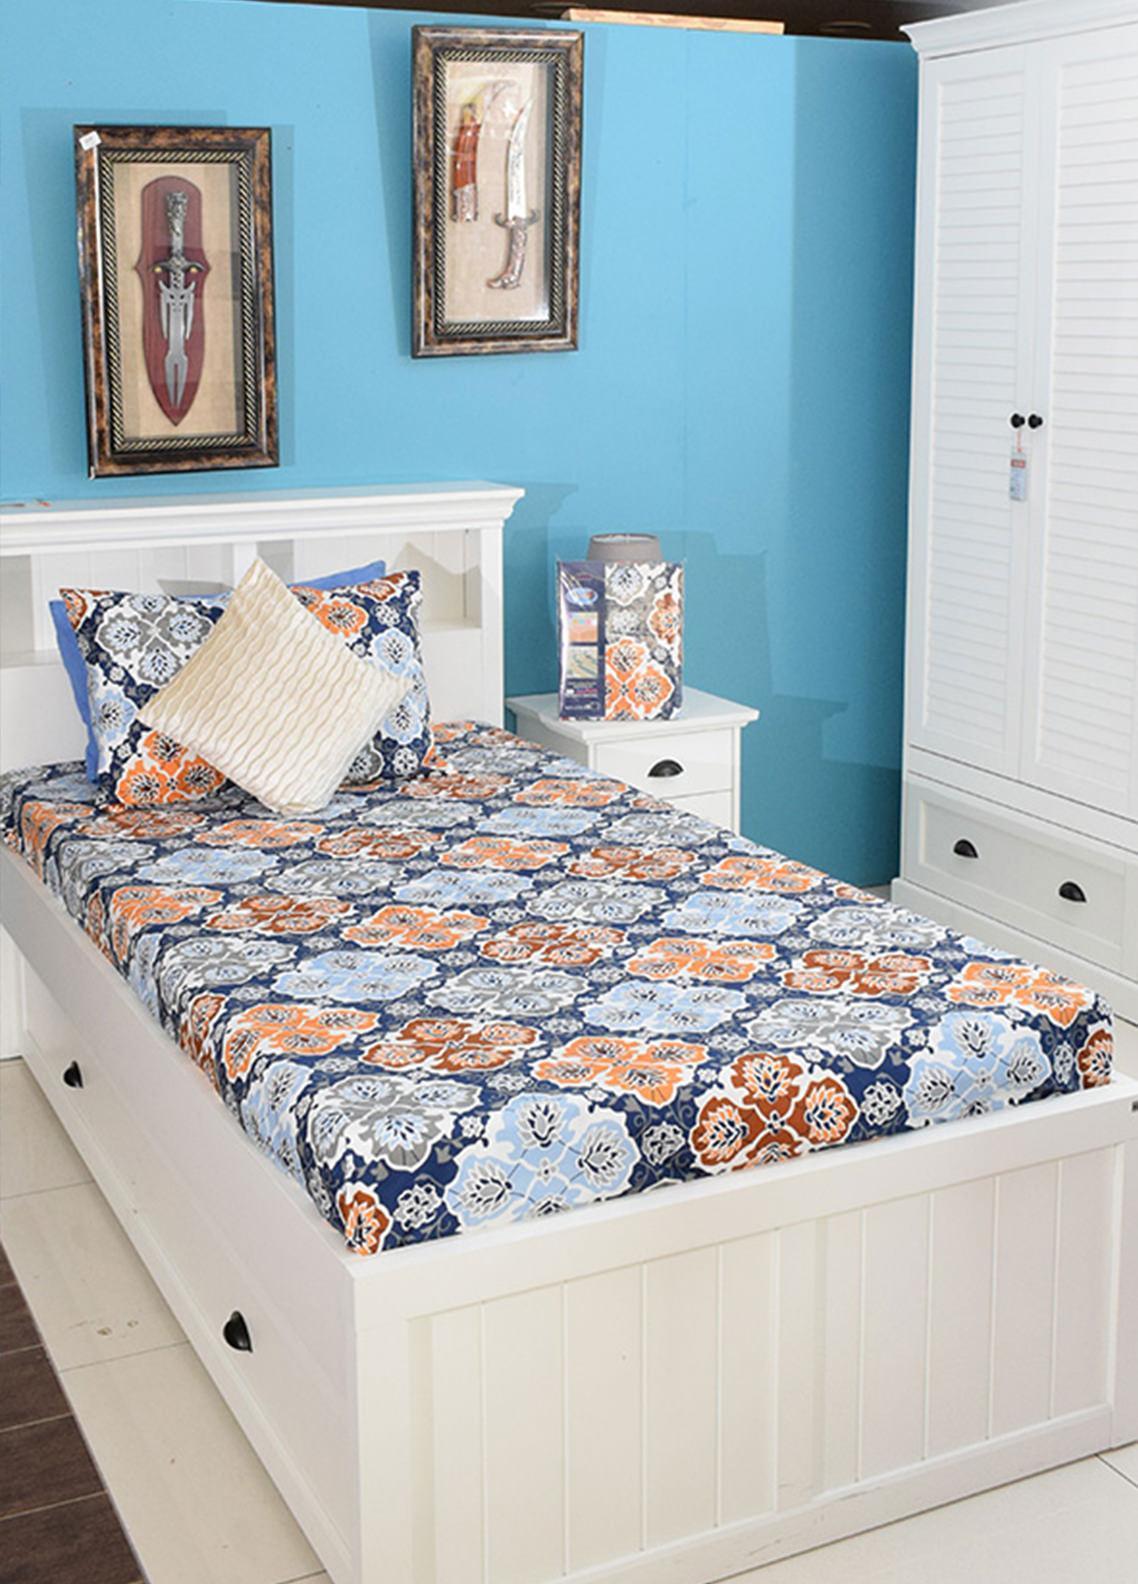 Plush Mink Single Bed Man Made Material Fantasy Bed Sheet Supreme Finish FS04 - Home & Decor